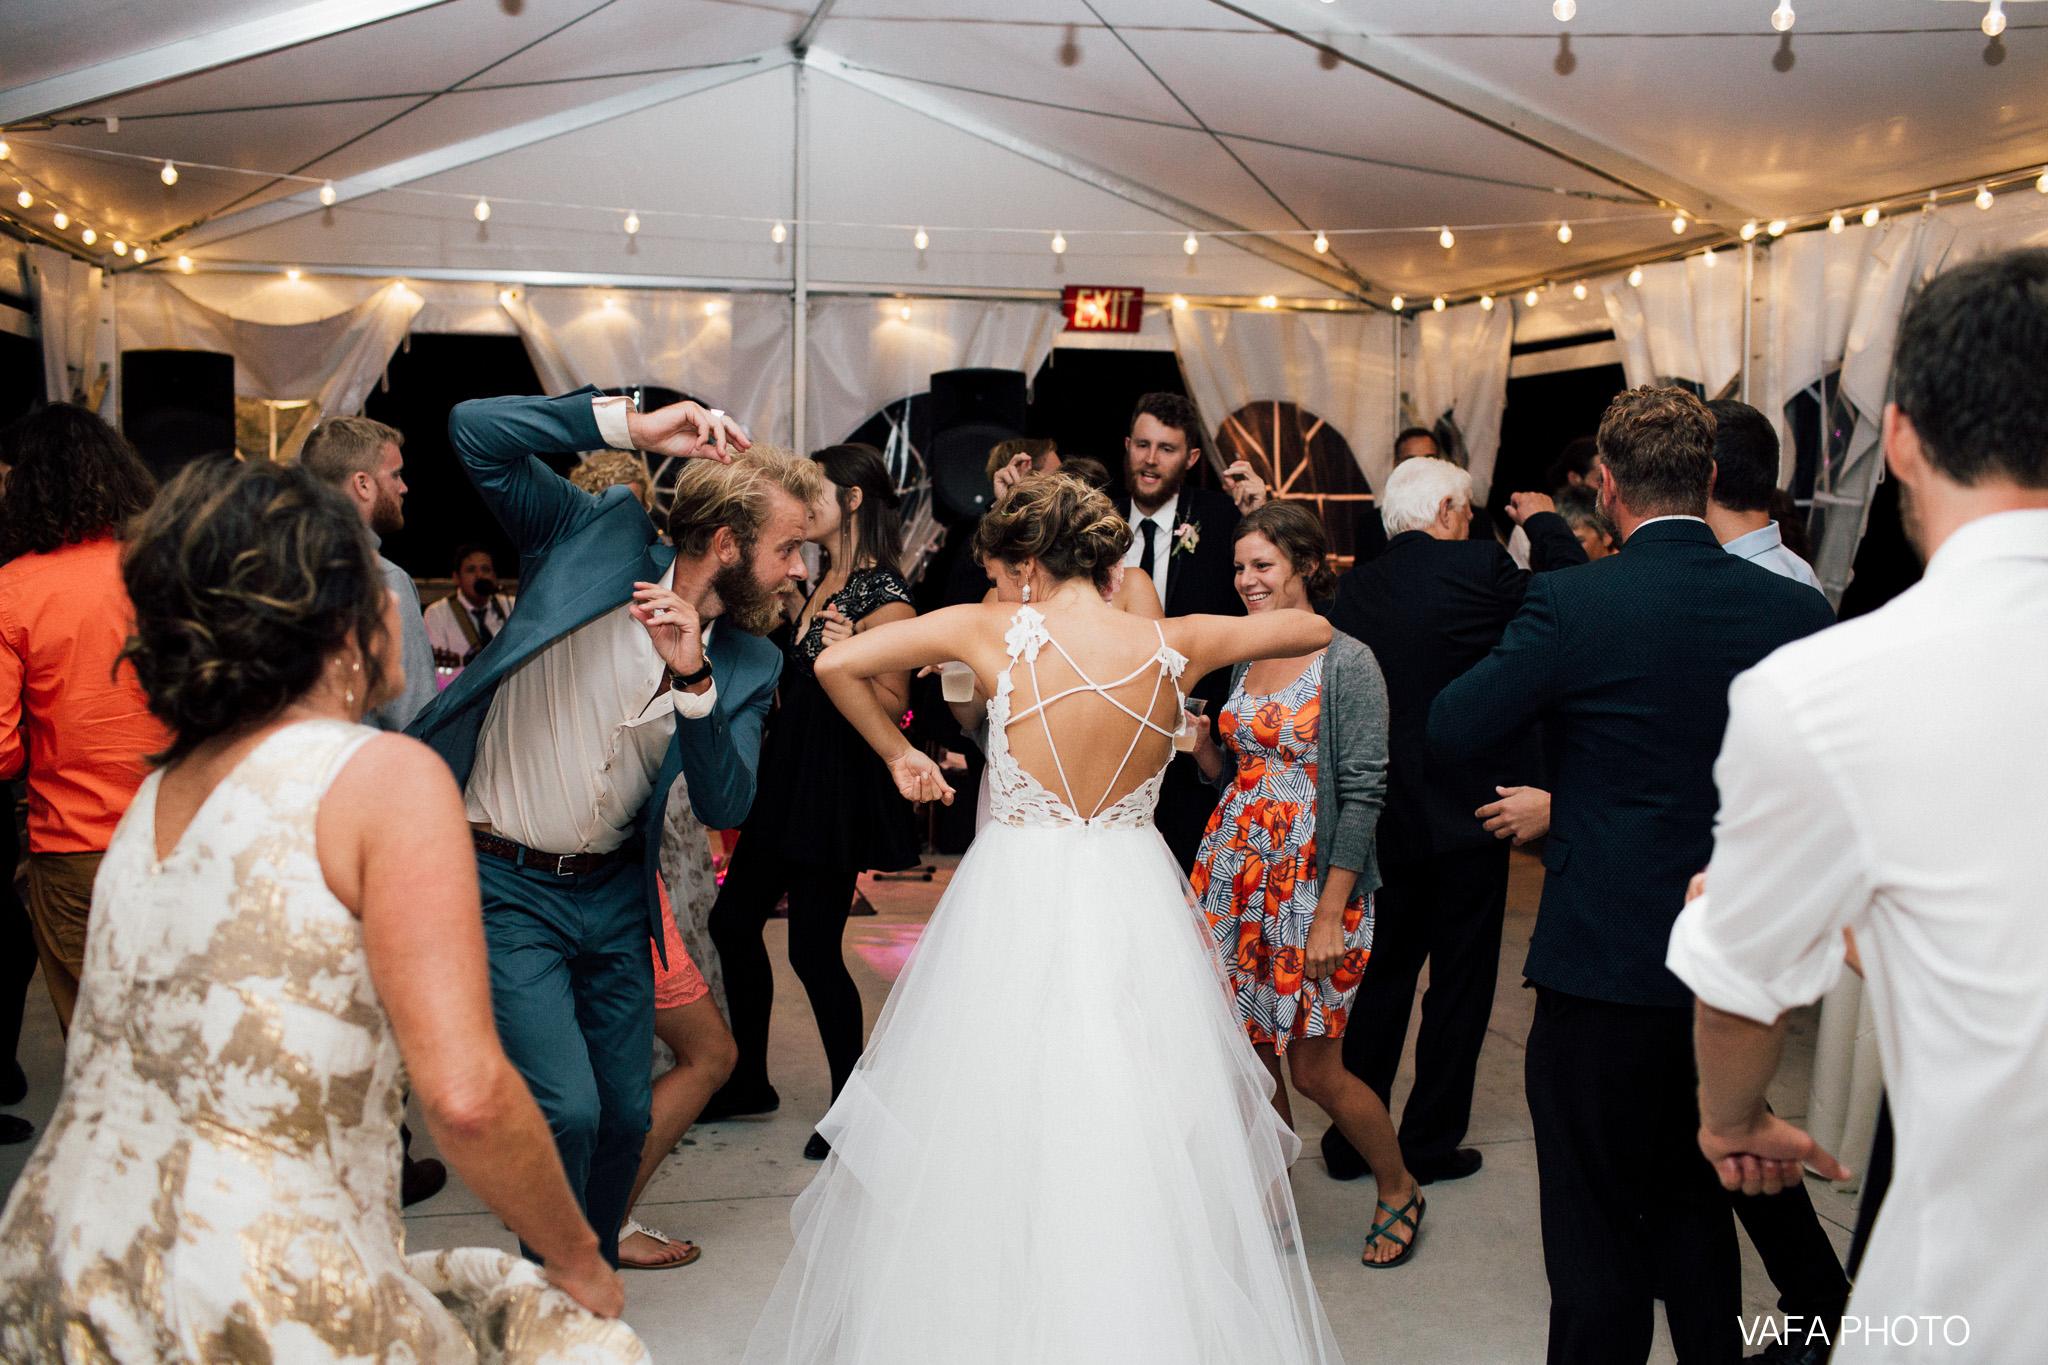 The-Felt-Estate-Wedding-Kailie-David-Vafa-Photo-1240.jpg